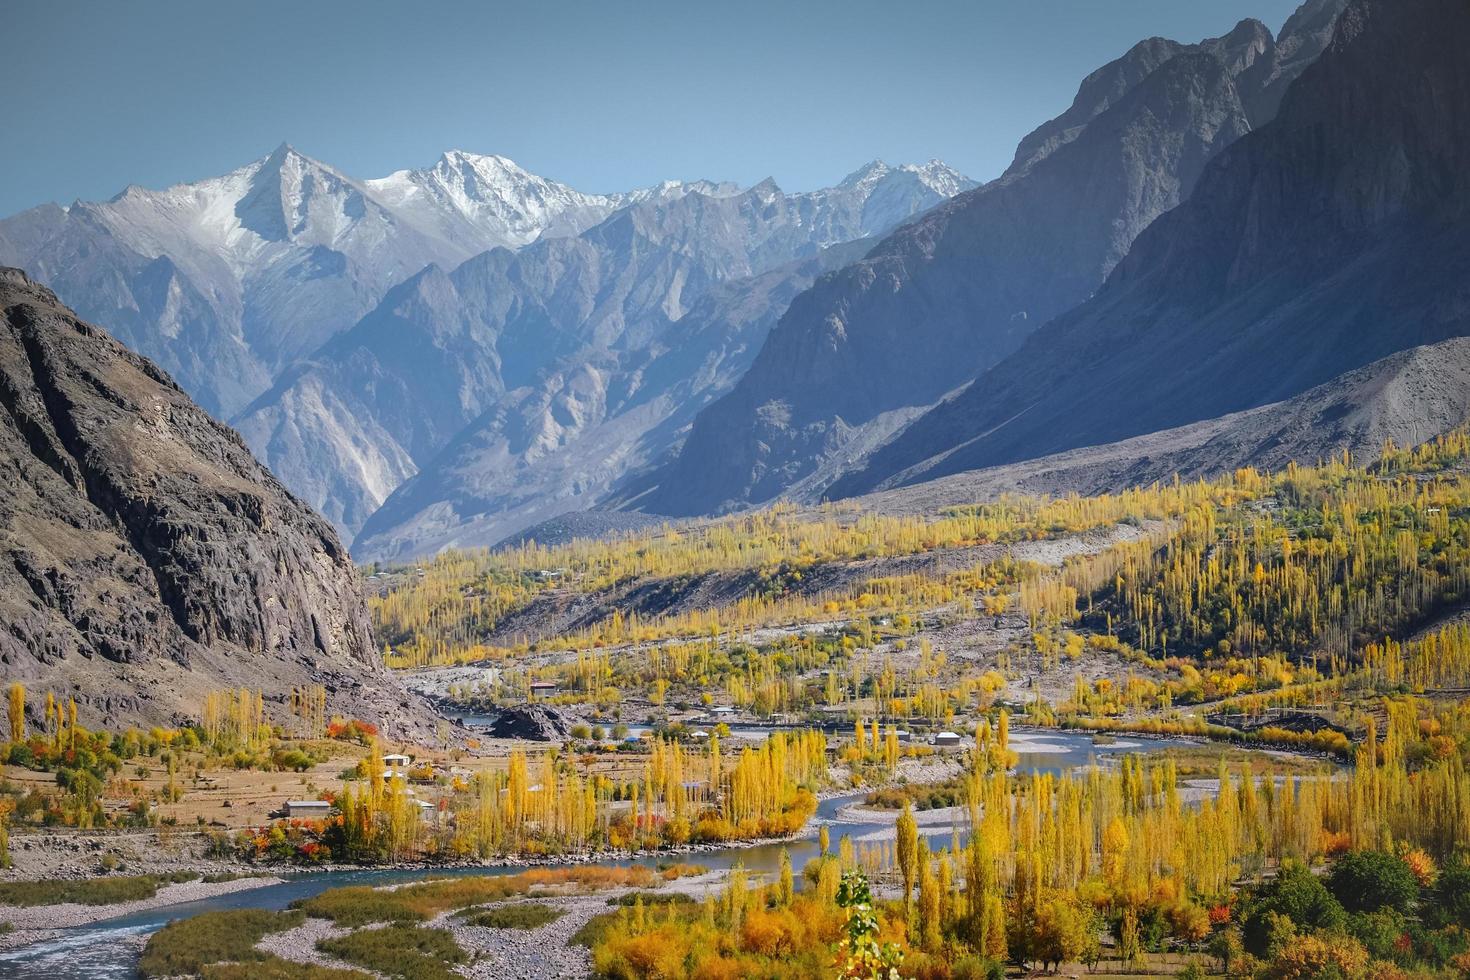 Winding river flowing through mountainous area in autumn photo